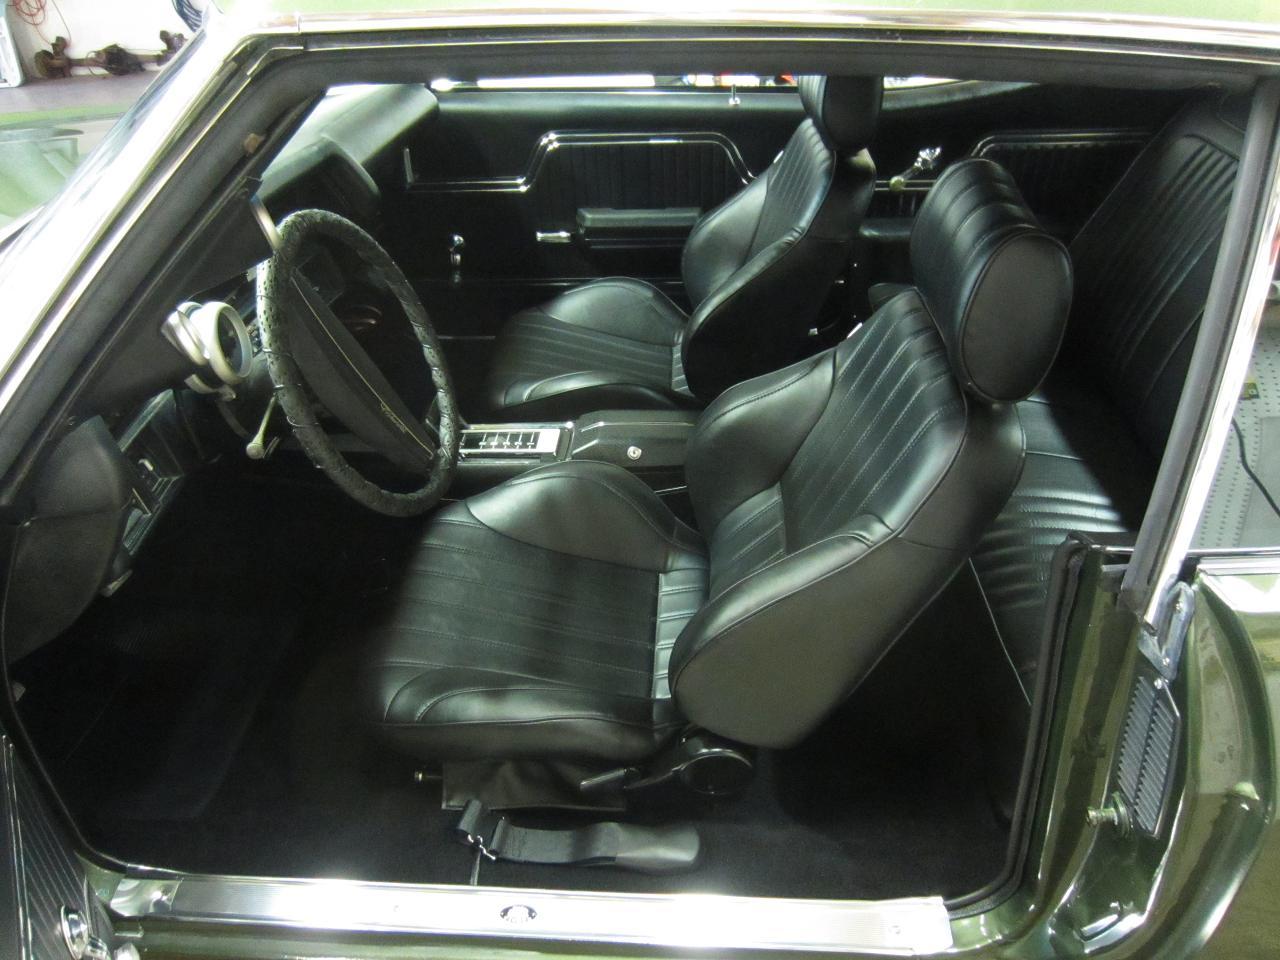 1971-Chevrolet-Chevelle-c2